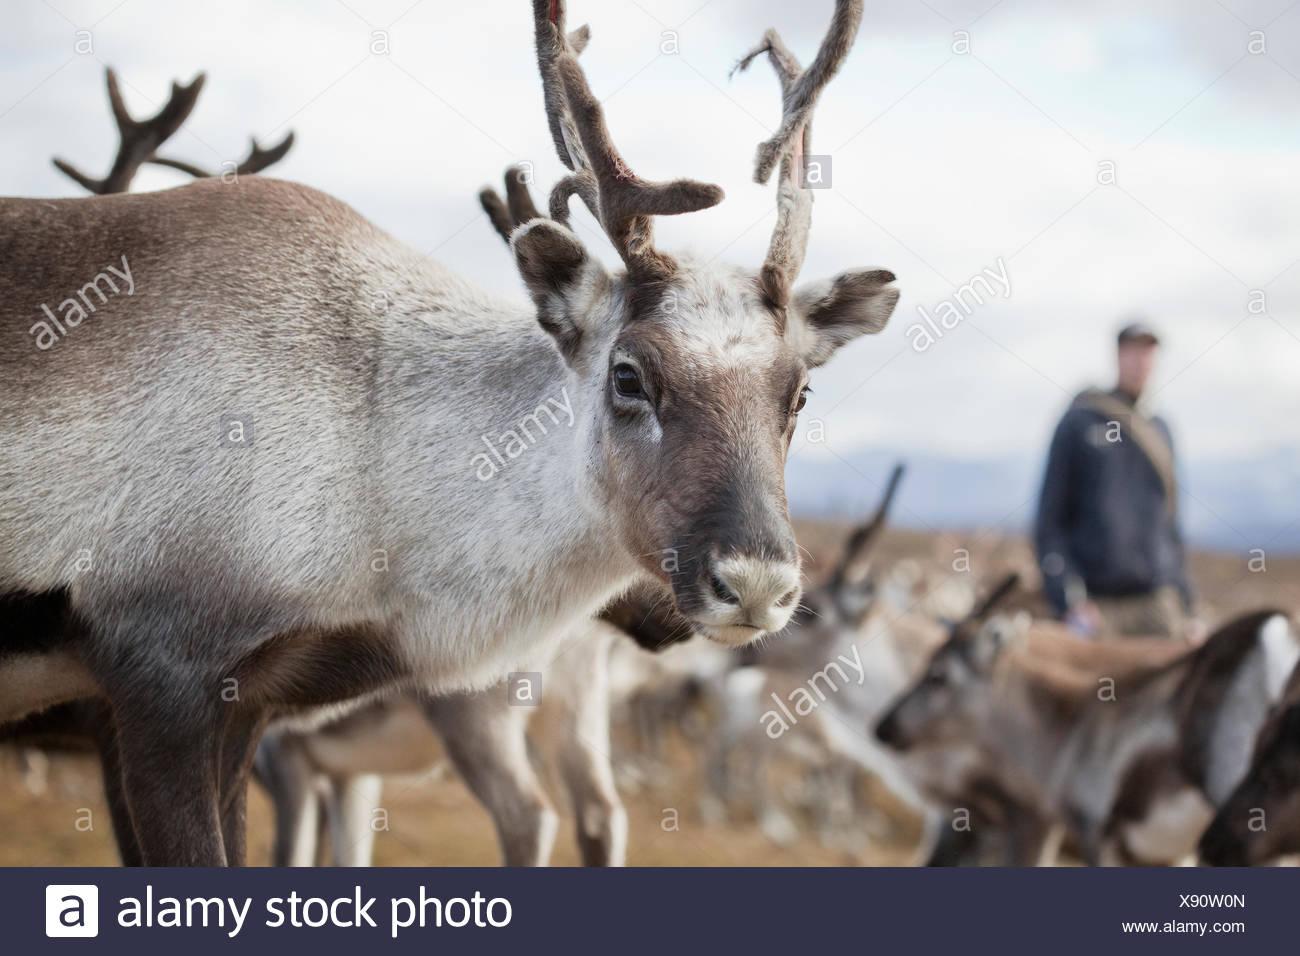 Suecia, Laponia, levas, Renos (Rangifer tarandus) mirando a la cámara Imagen De Stock